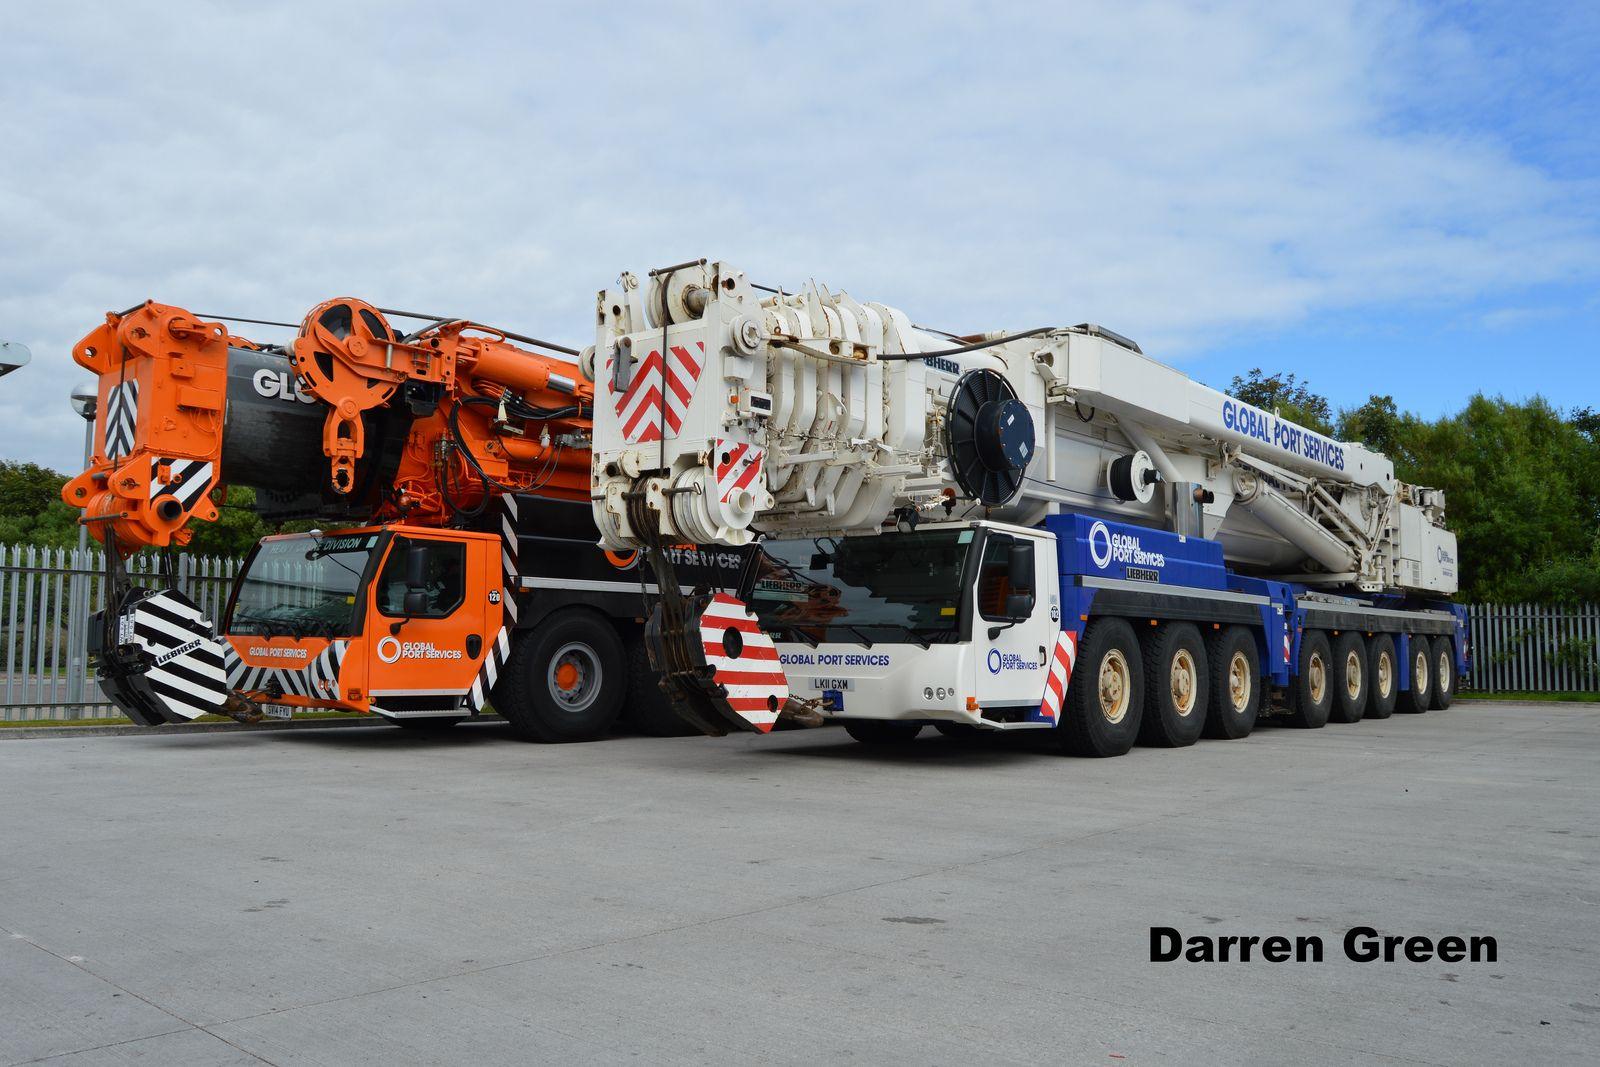 Global port services gruas maquinaria pesada camiones